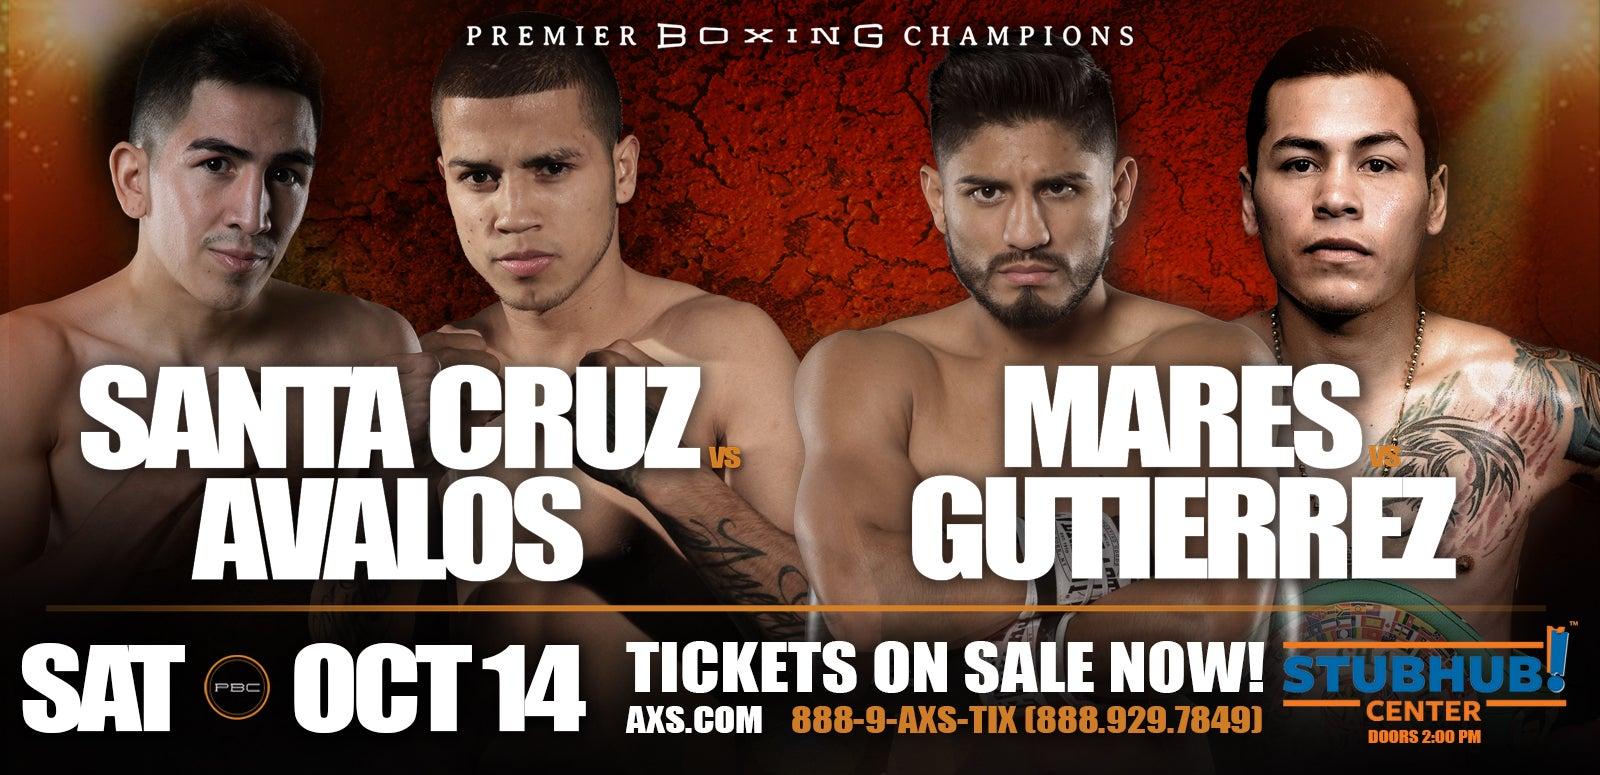 Premier Boxing Champions:  Santa Cruz vs. Avalos / Mares vs. Gutierrez